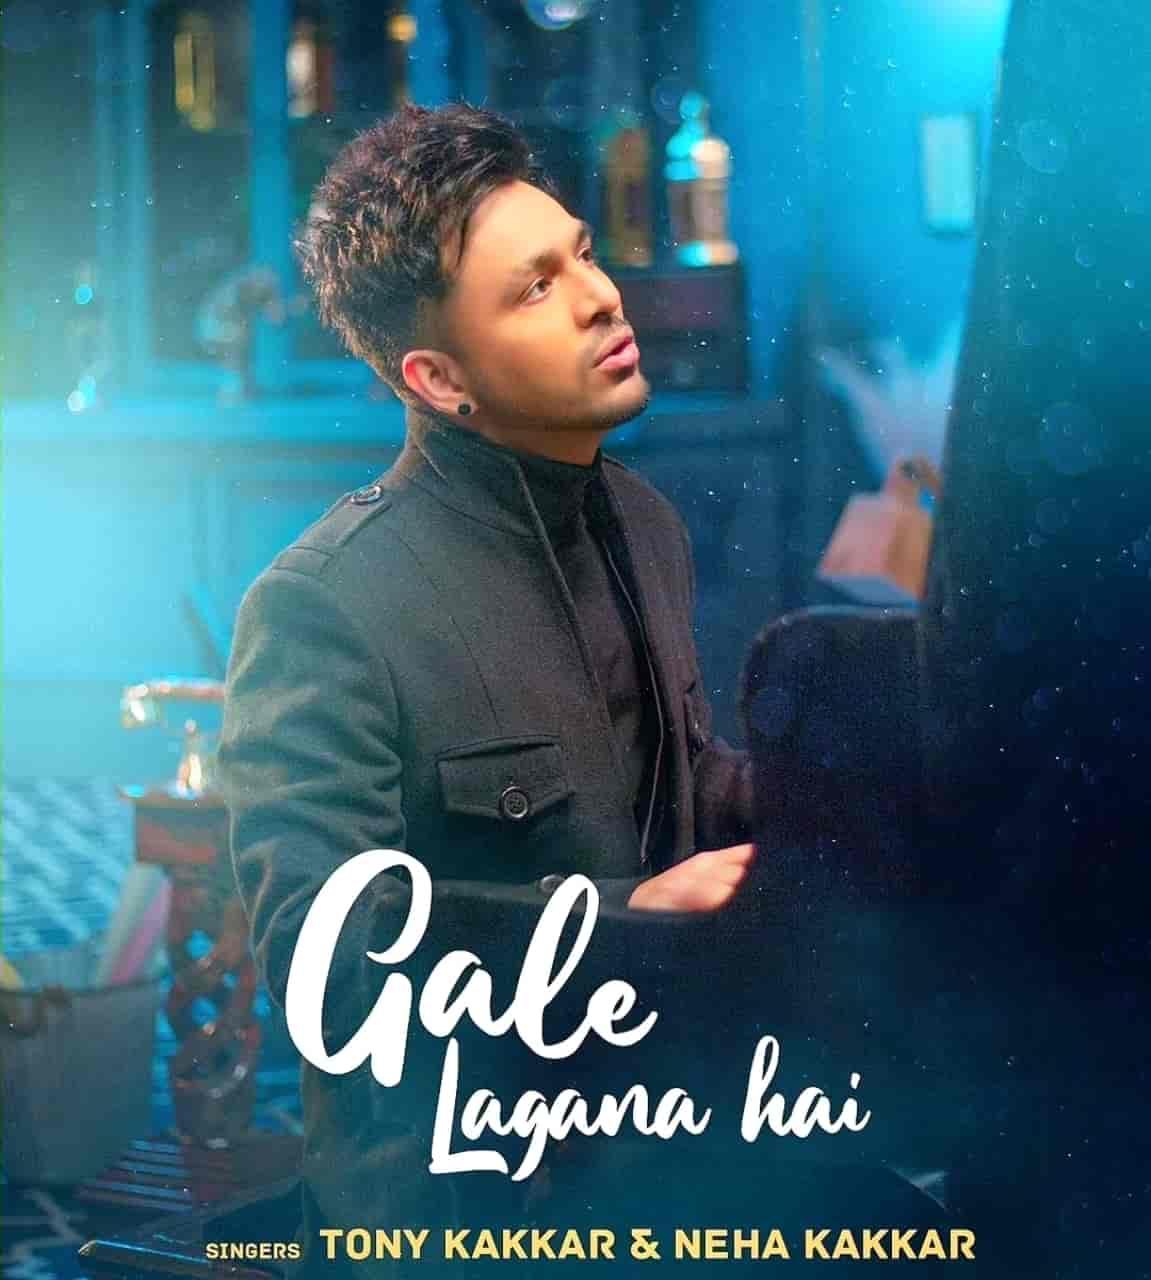 Gale Lagana Hai Hindi Song Image Features Tony Kakkar and Neha Kakkar